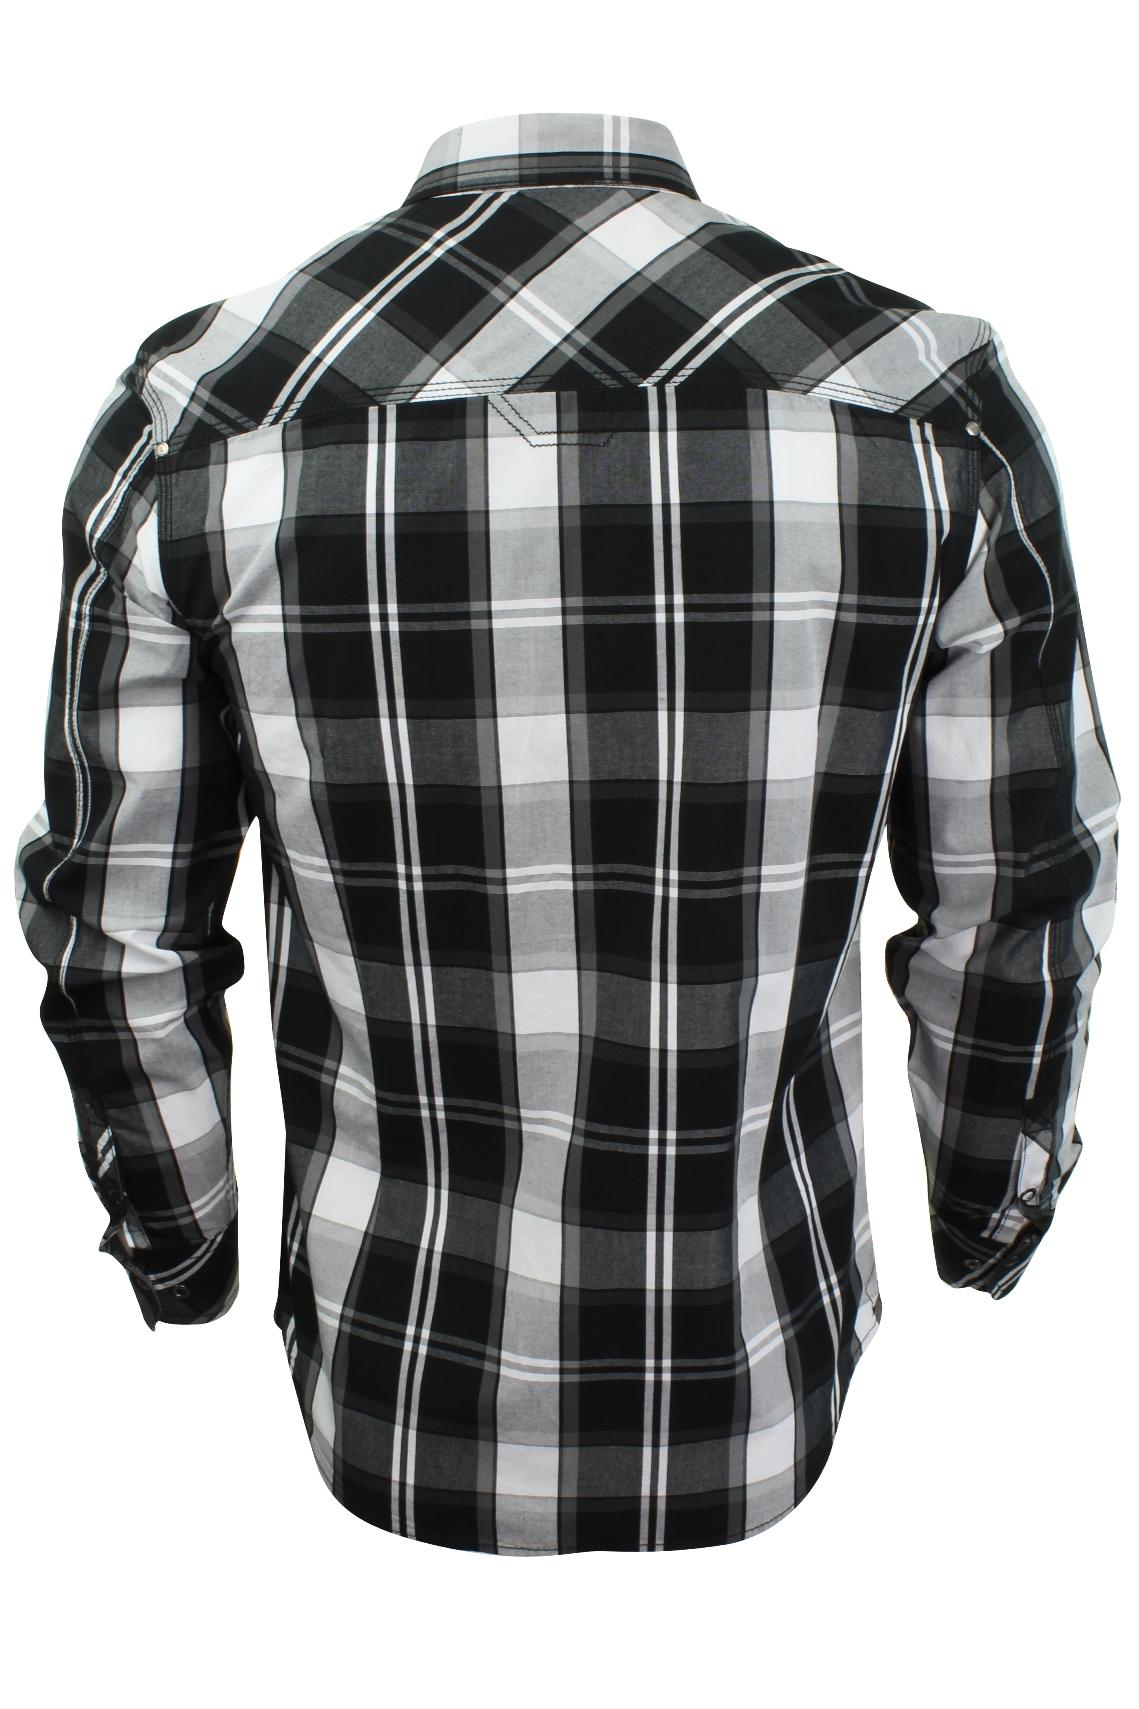 Mens-Check-Shirt-by-Dissident-039-Distrikt-039-Long-Sleeved thumbnail 5